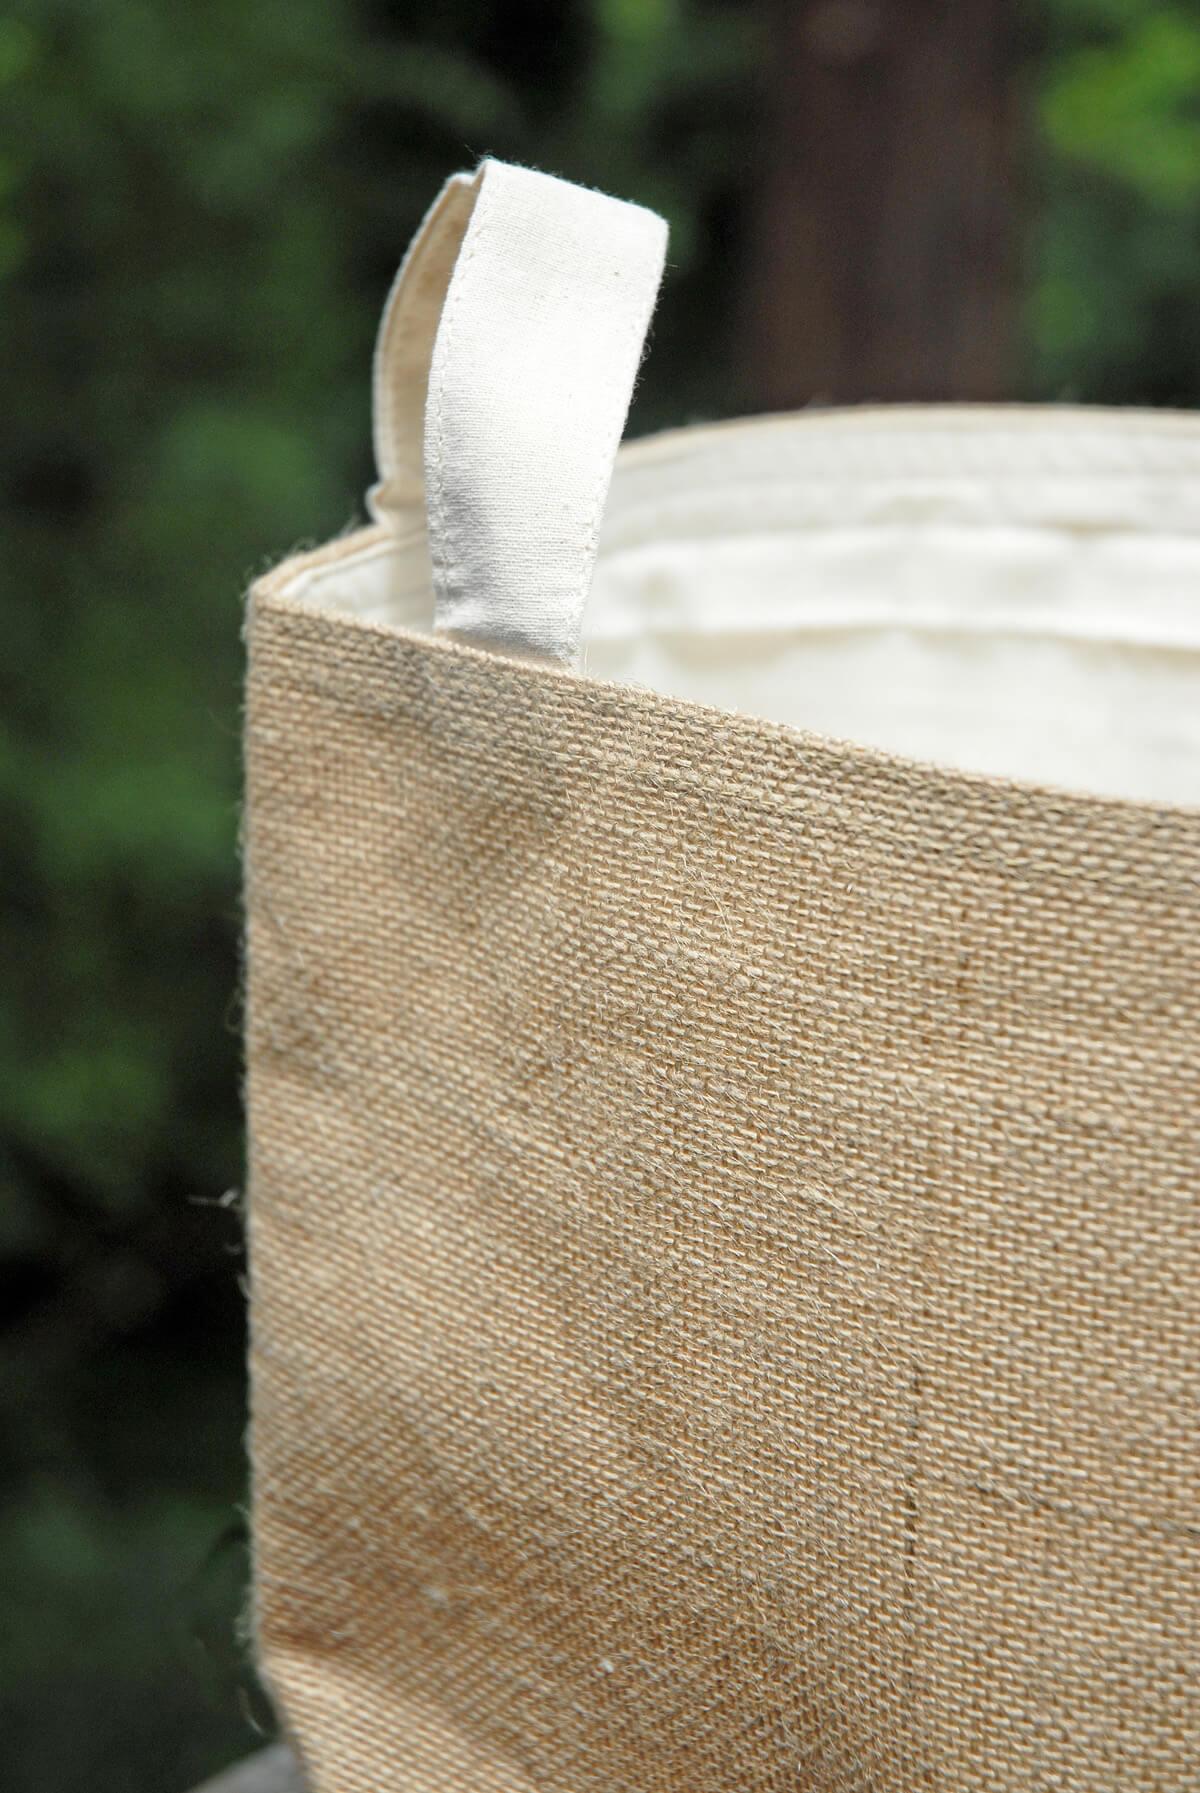 Burlap storage bag 13x11 for Save on crafts burlap